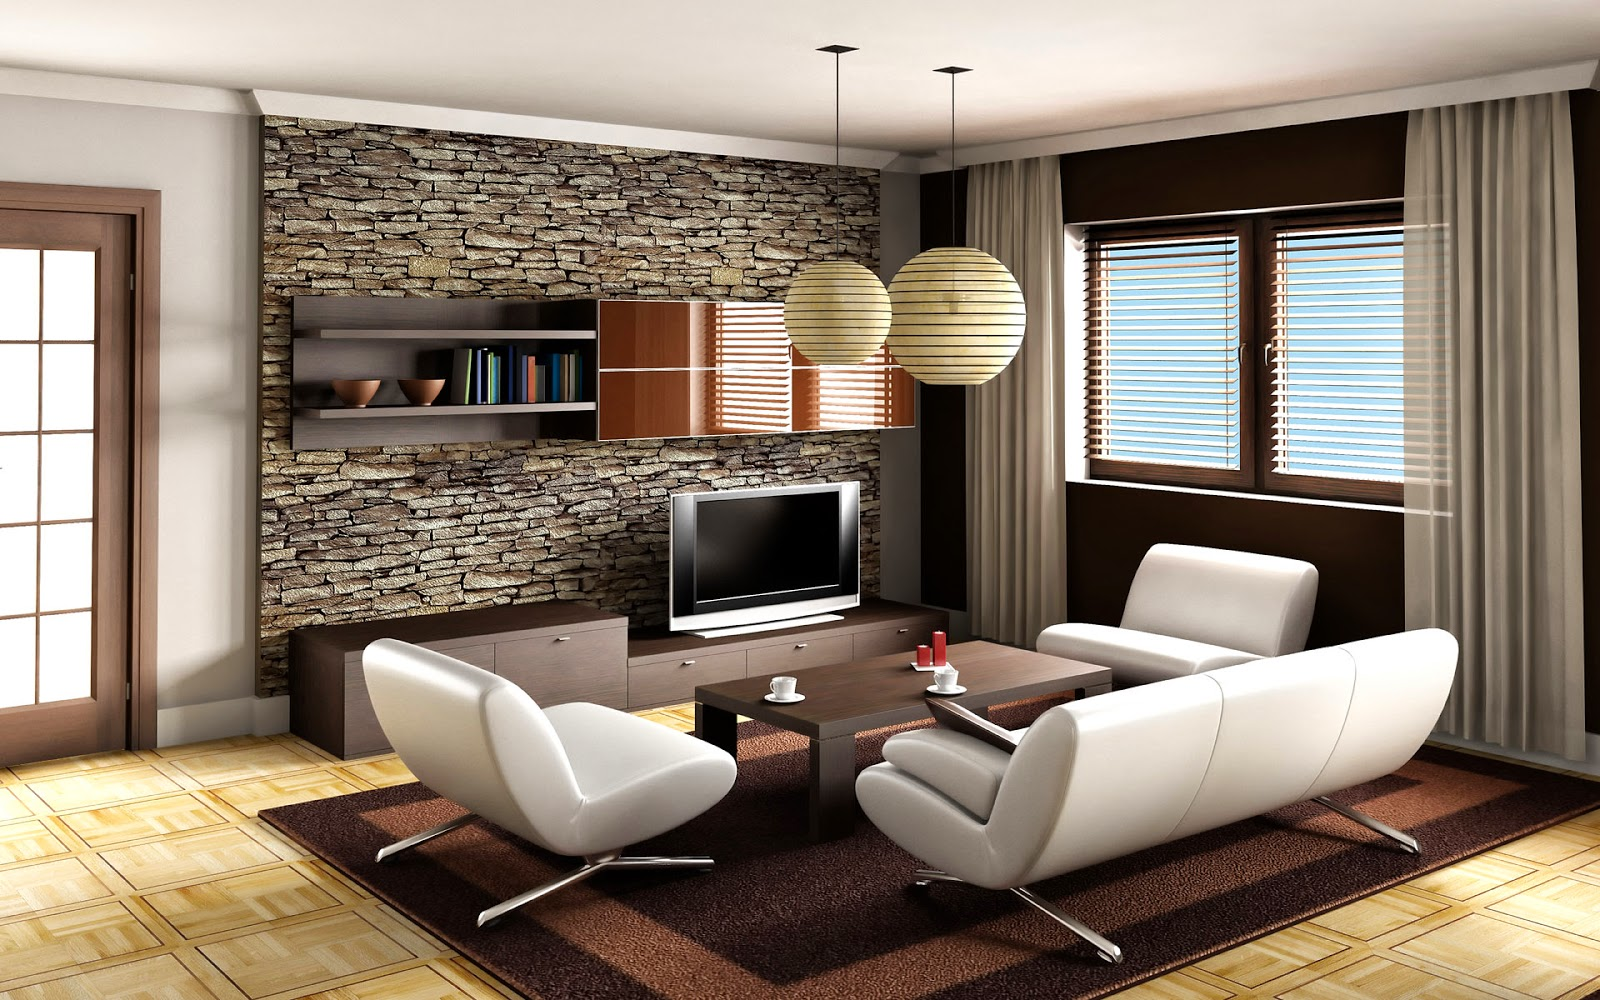 #2 Living Room Decor Ideas Brown Leather Sofa | Home ... on Room Decoration Ideas  id=57886